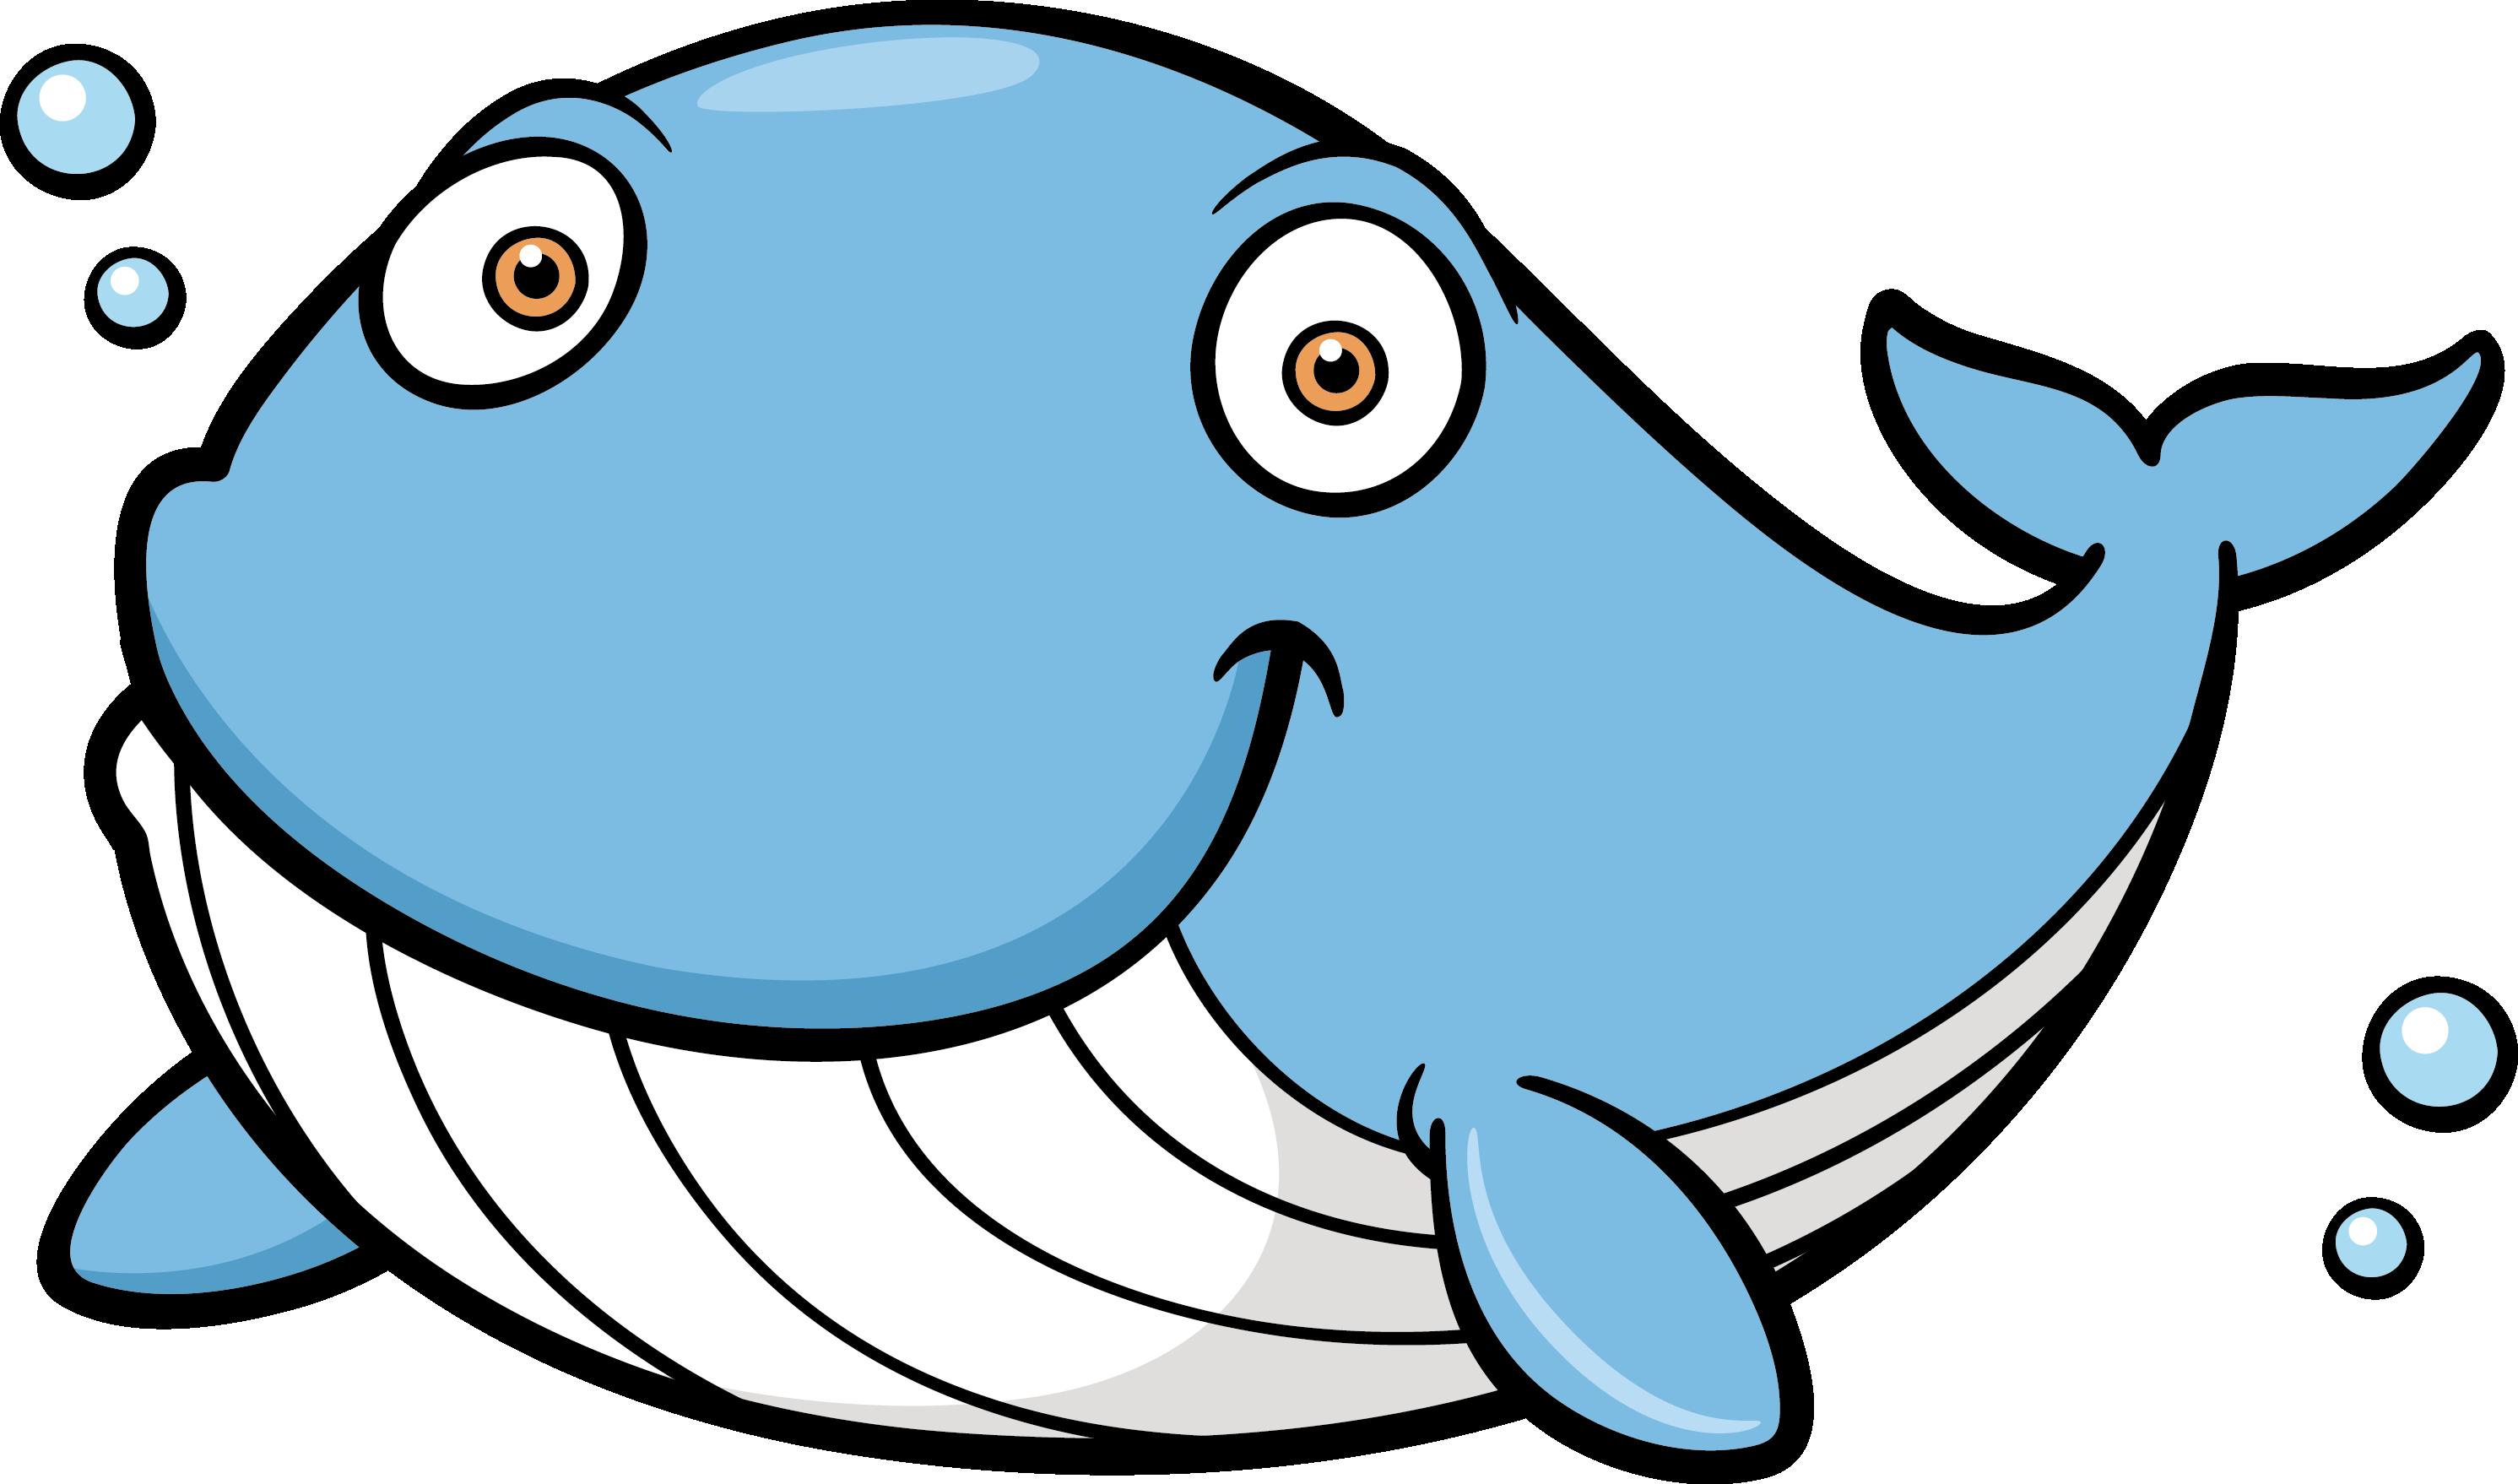 Transparent Whale Clipart Png - Blue Whale Cartoon Png ...